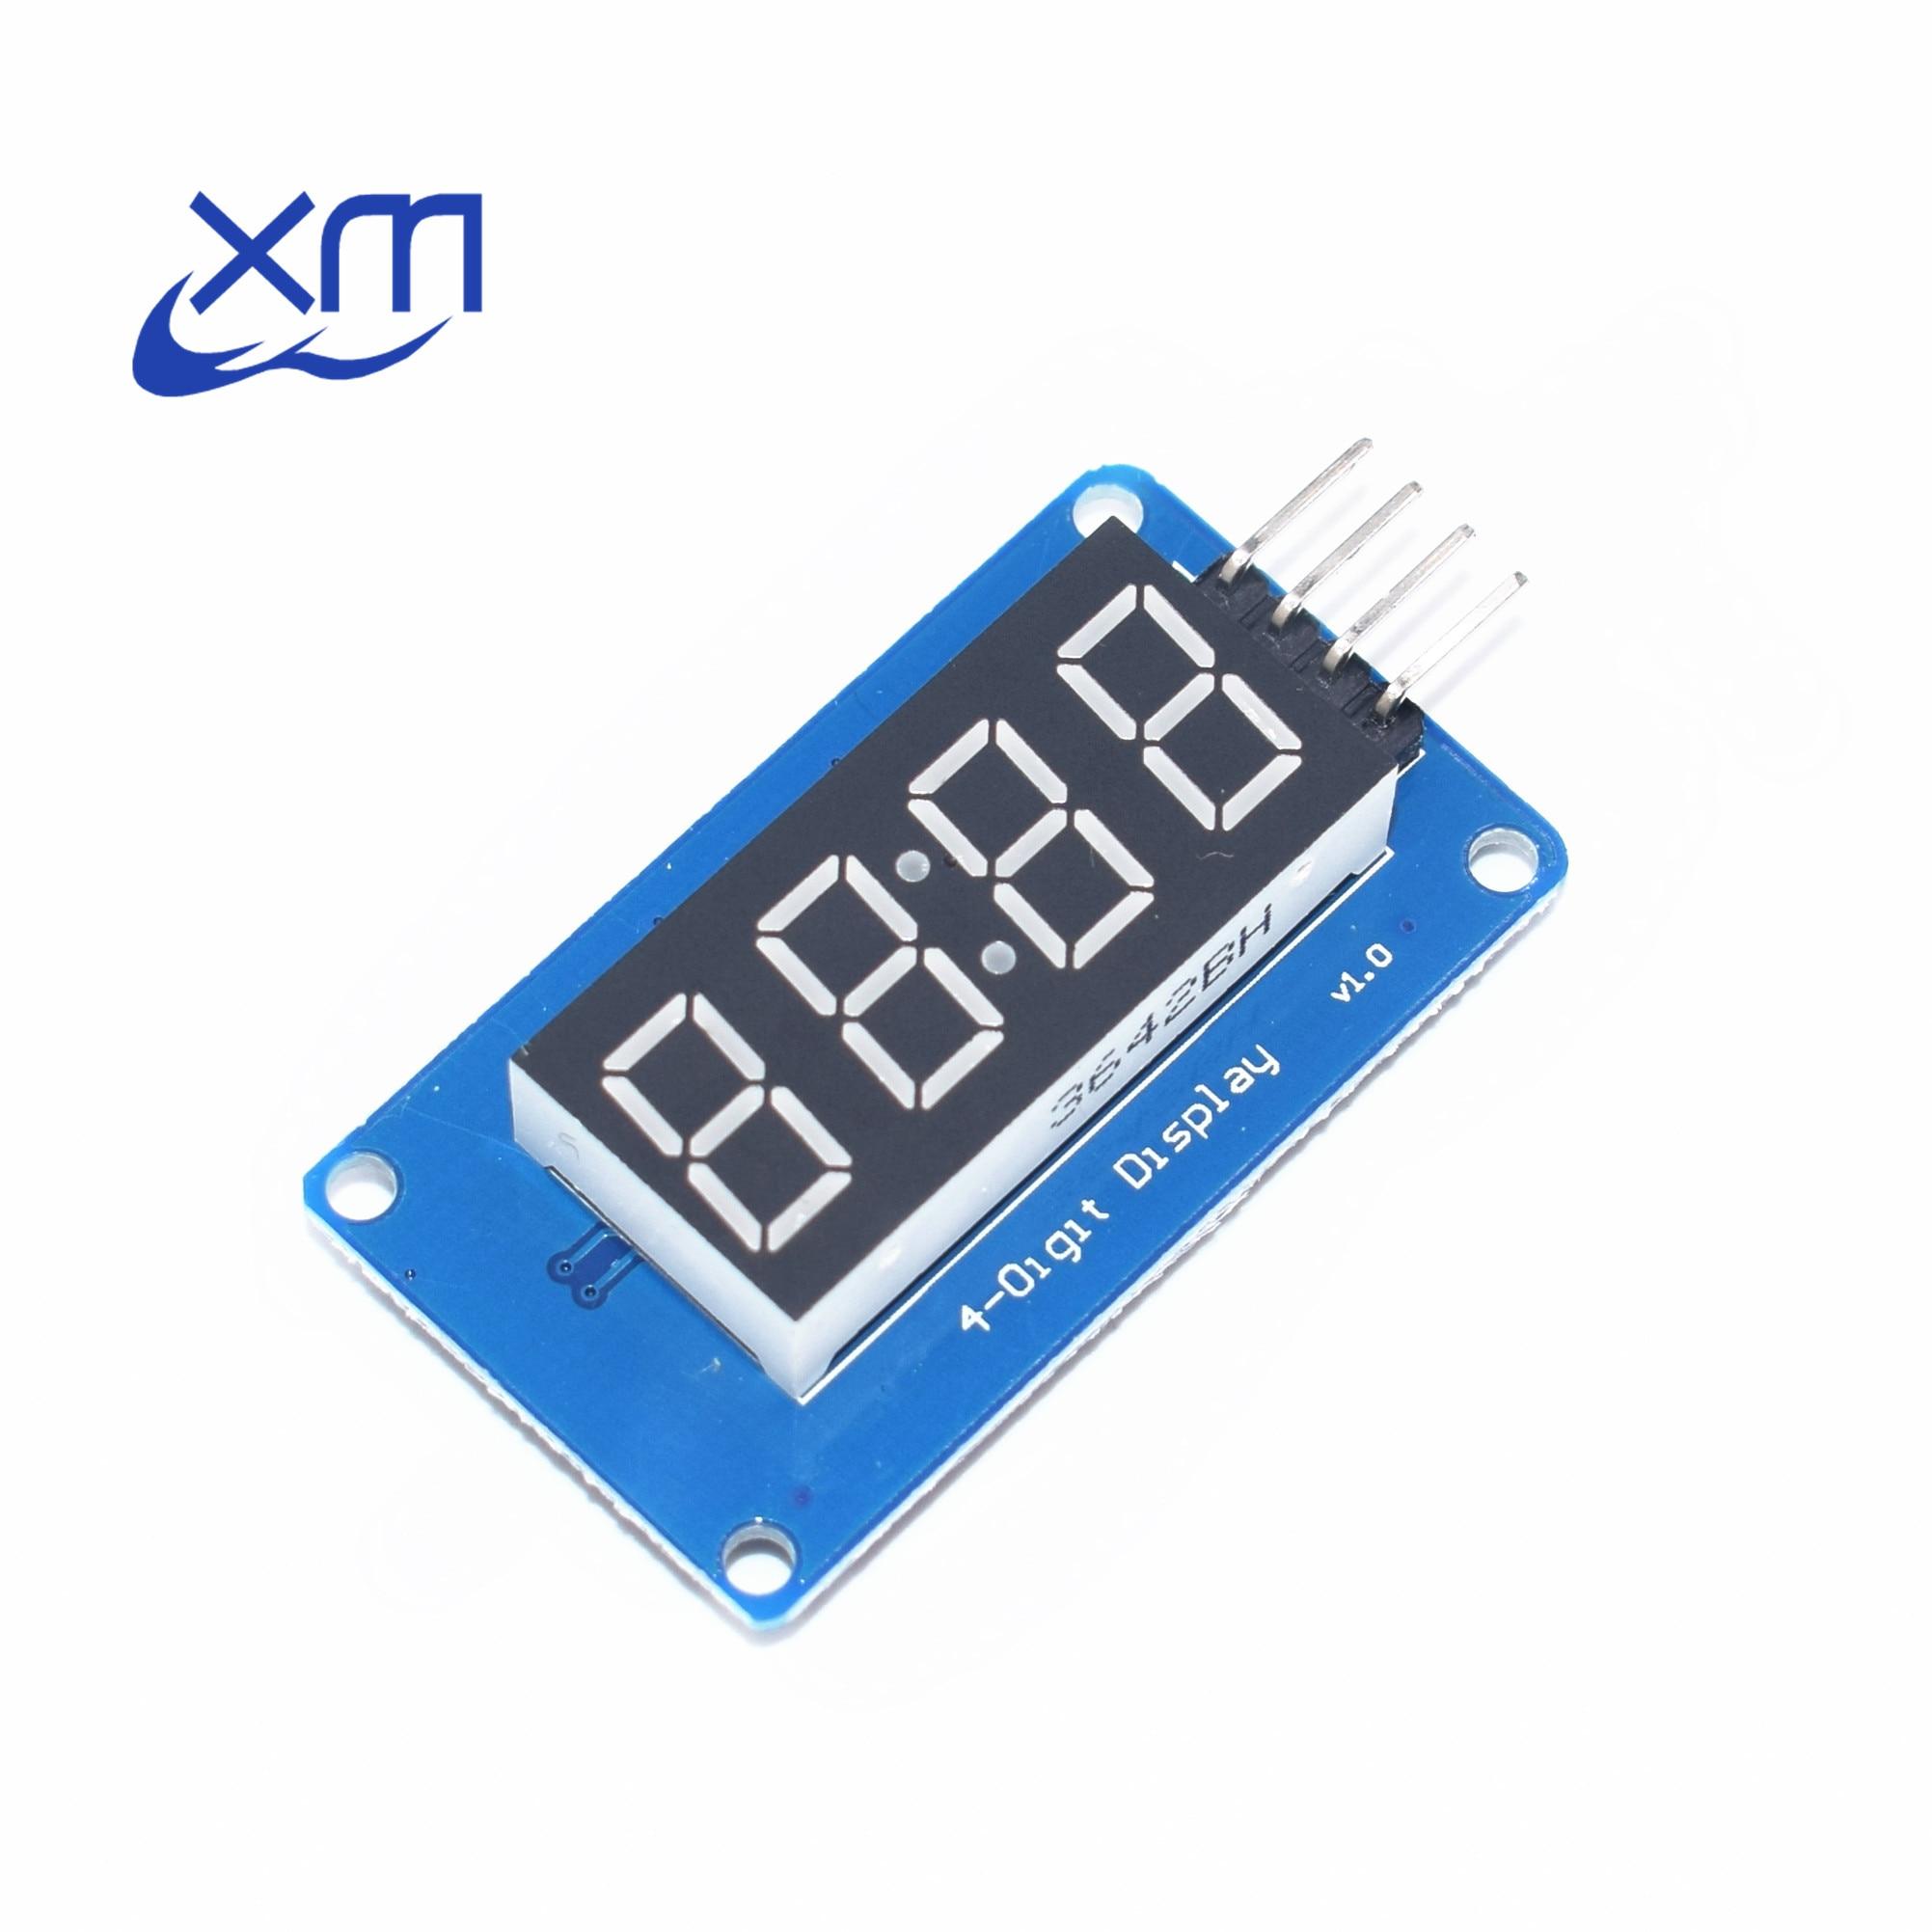 100pcs 4 Bits TM1637 Red Digital Tube LED Display Module & Clock  Free Shipping B51